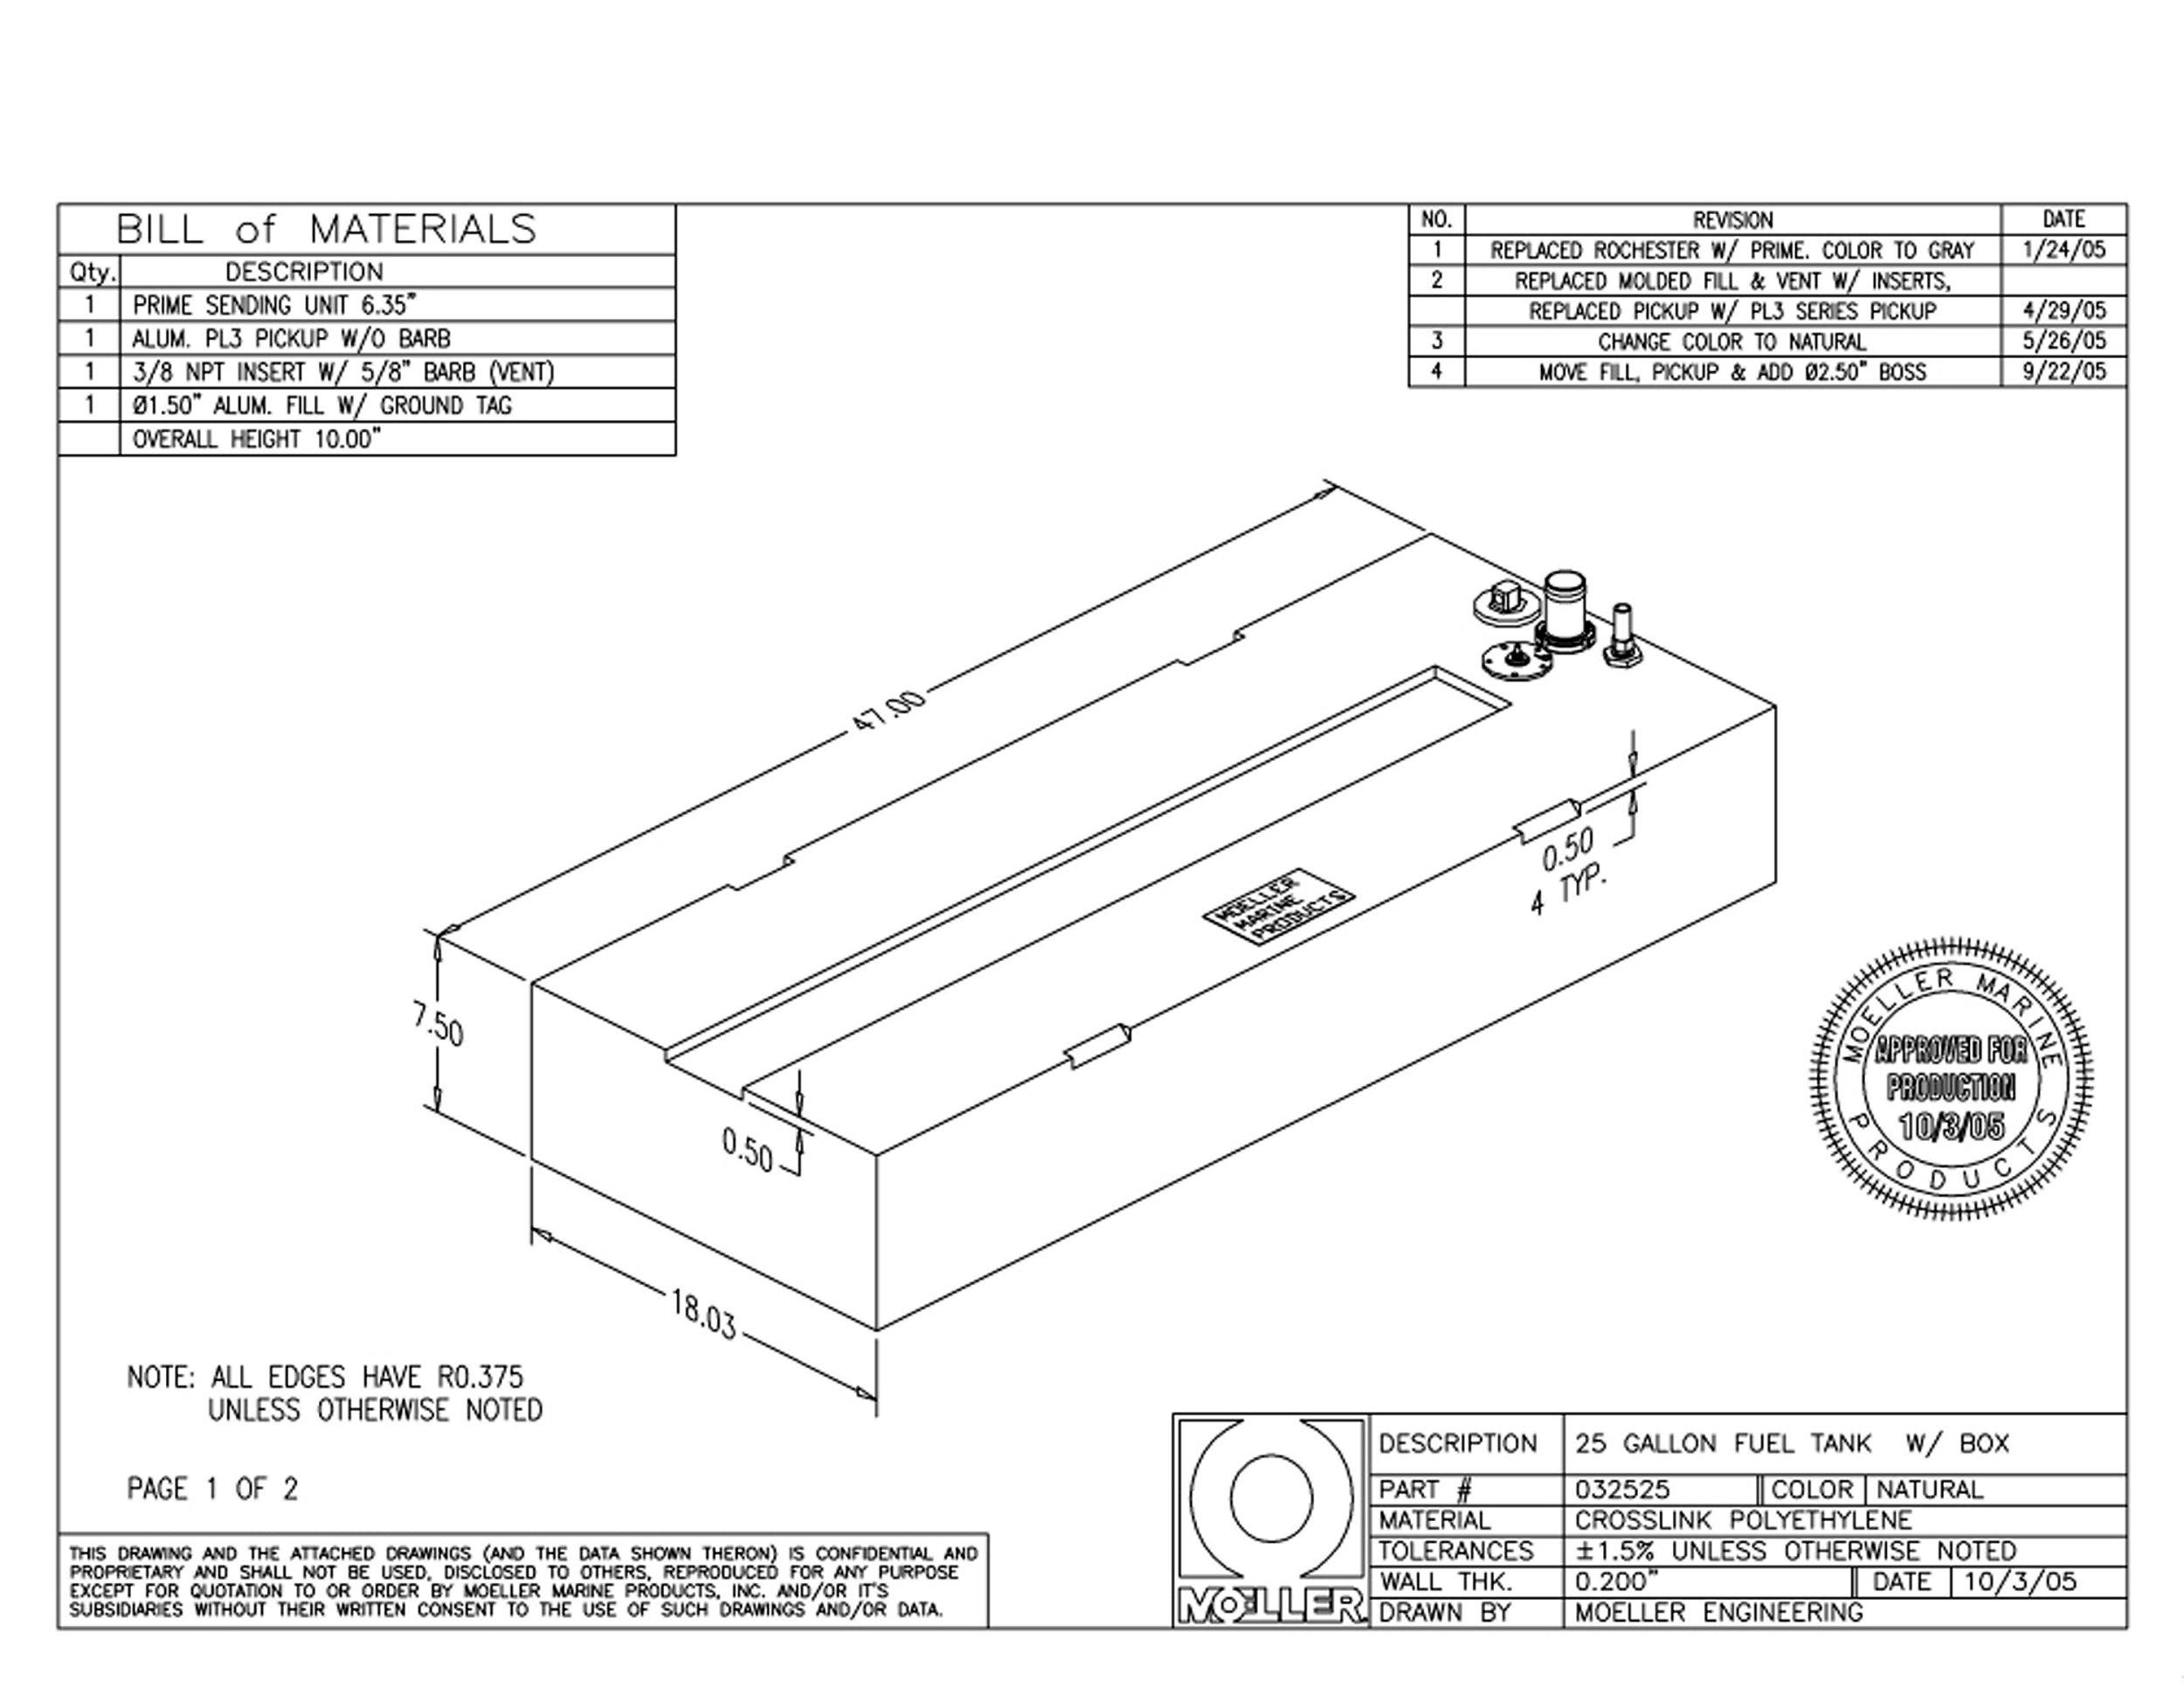 Moeller Marine Below Deck Permanent Fuel Tank (25-Gallon, 47'' x 18.03'' x 7.5'')